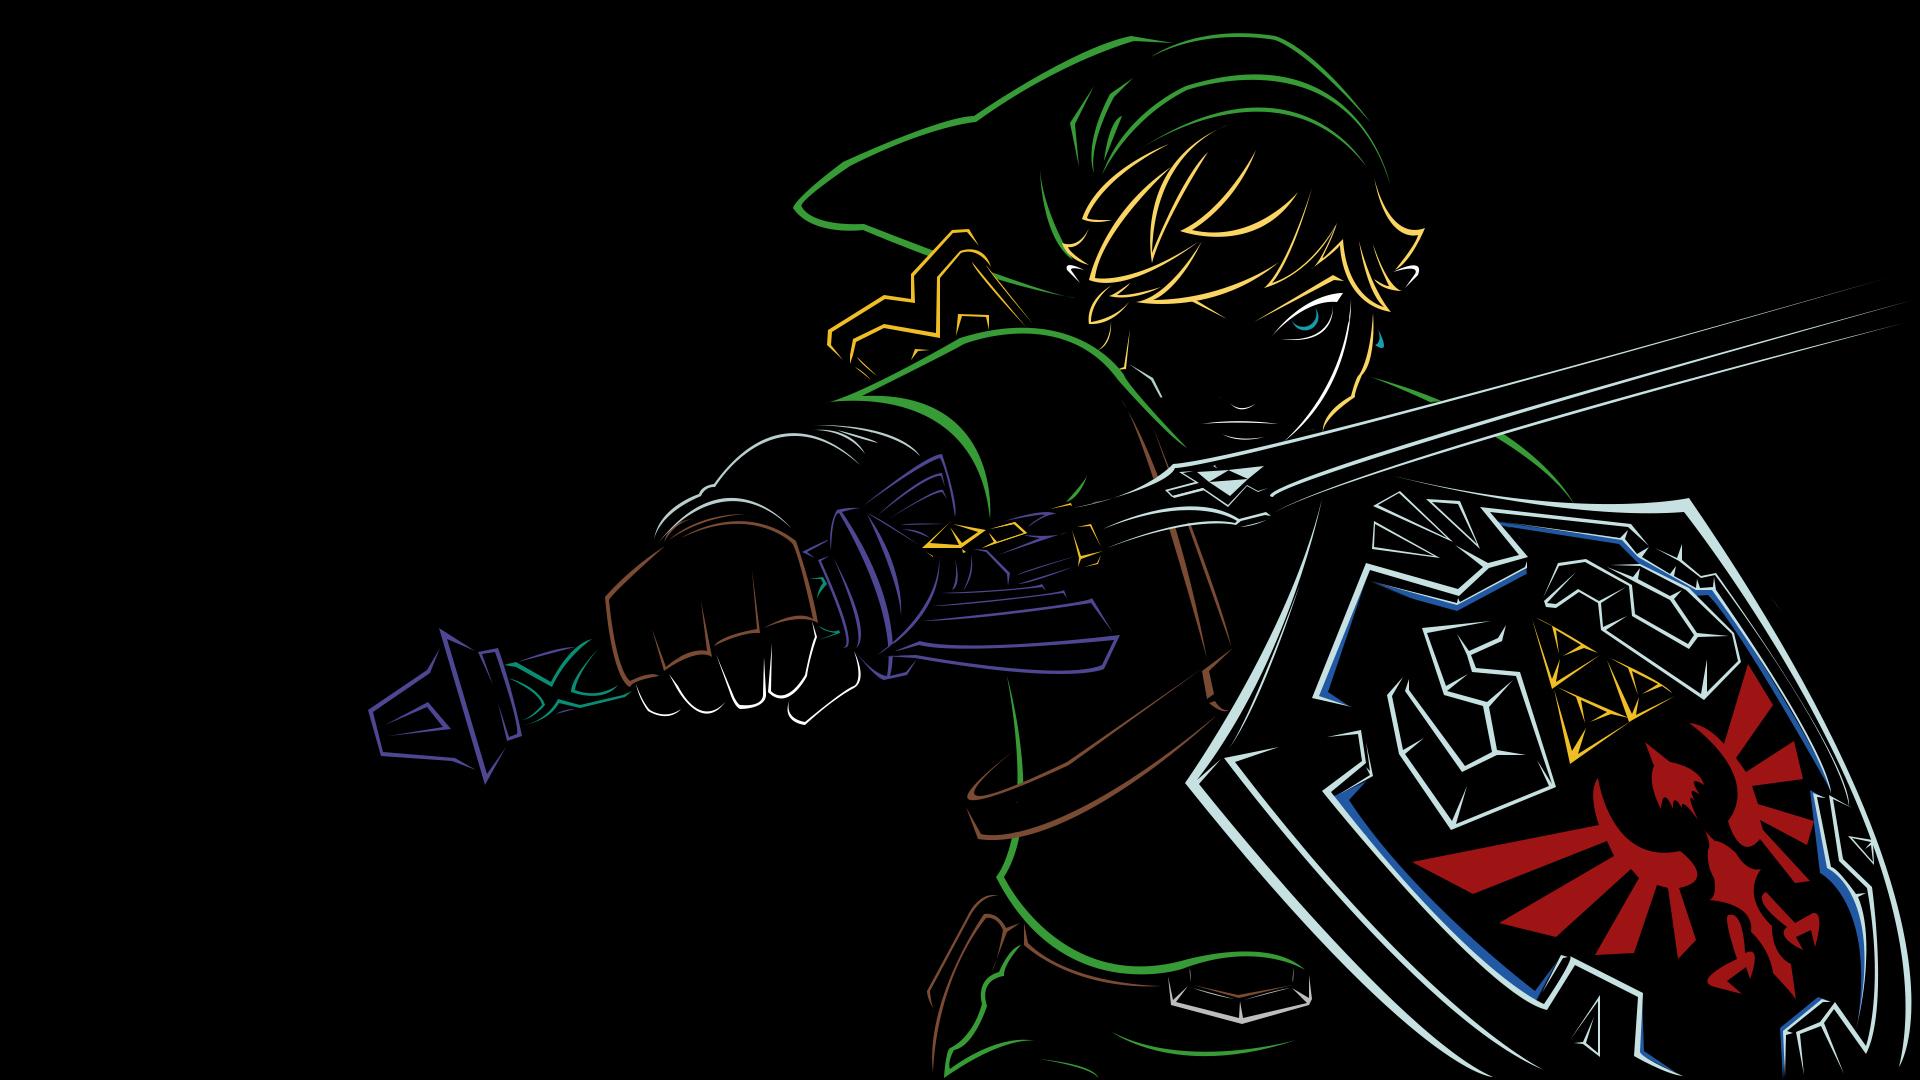 Awesome Zelda Wallpaper 47308 1920x1080px